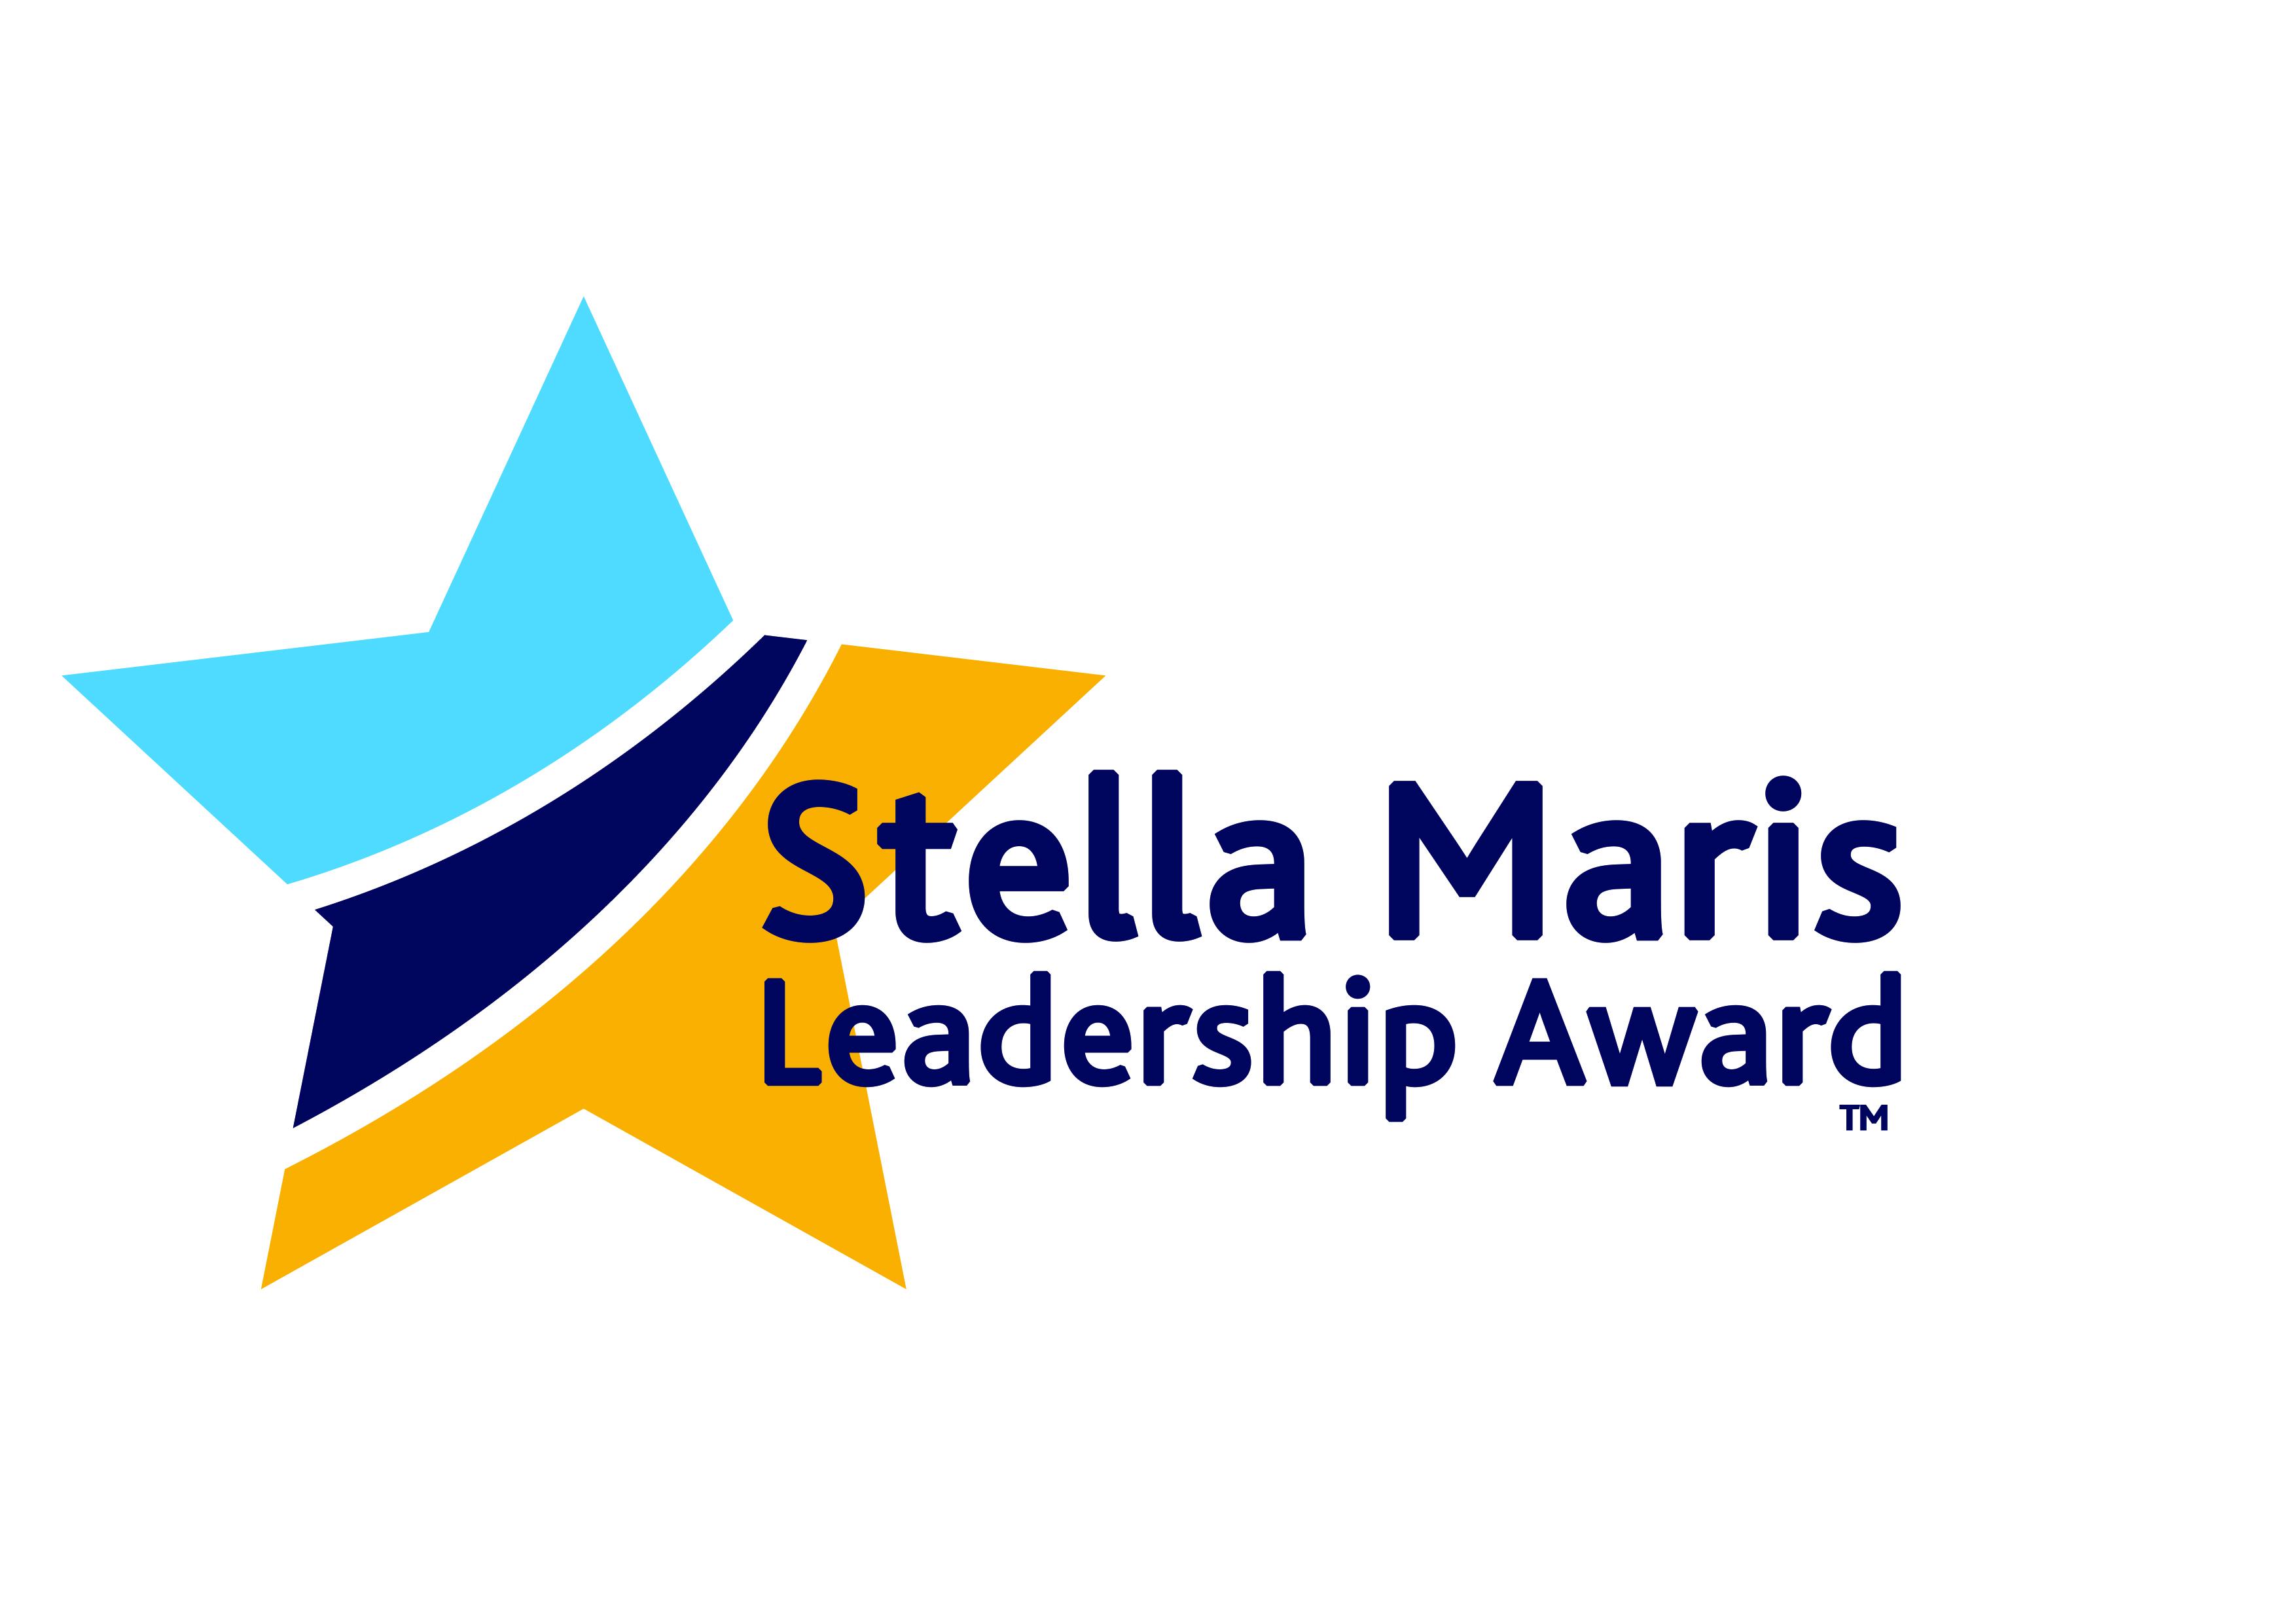 Stella Maris Leadership Award